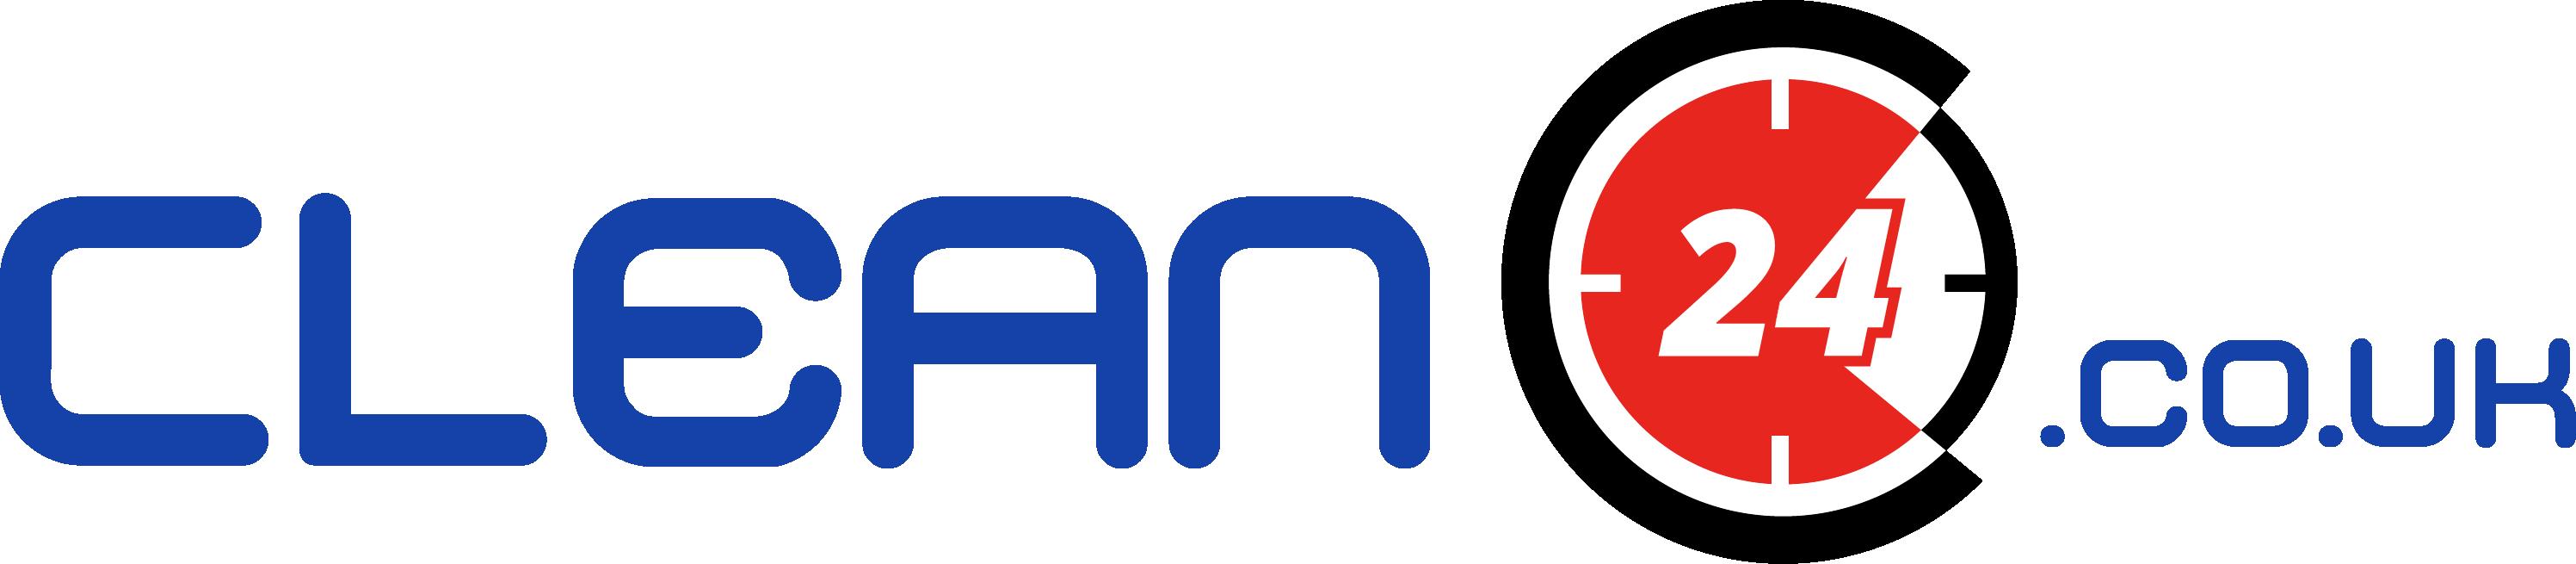 cleaning expert 24-7 ltd logo